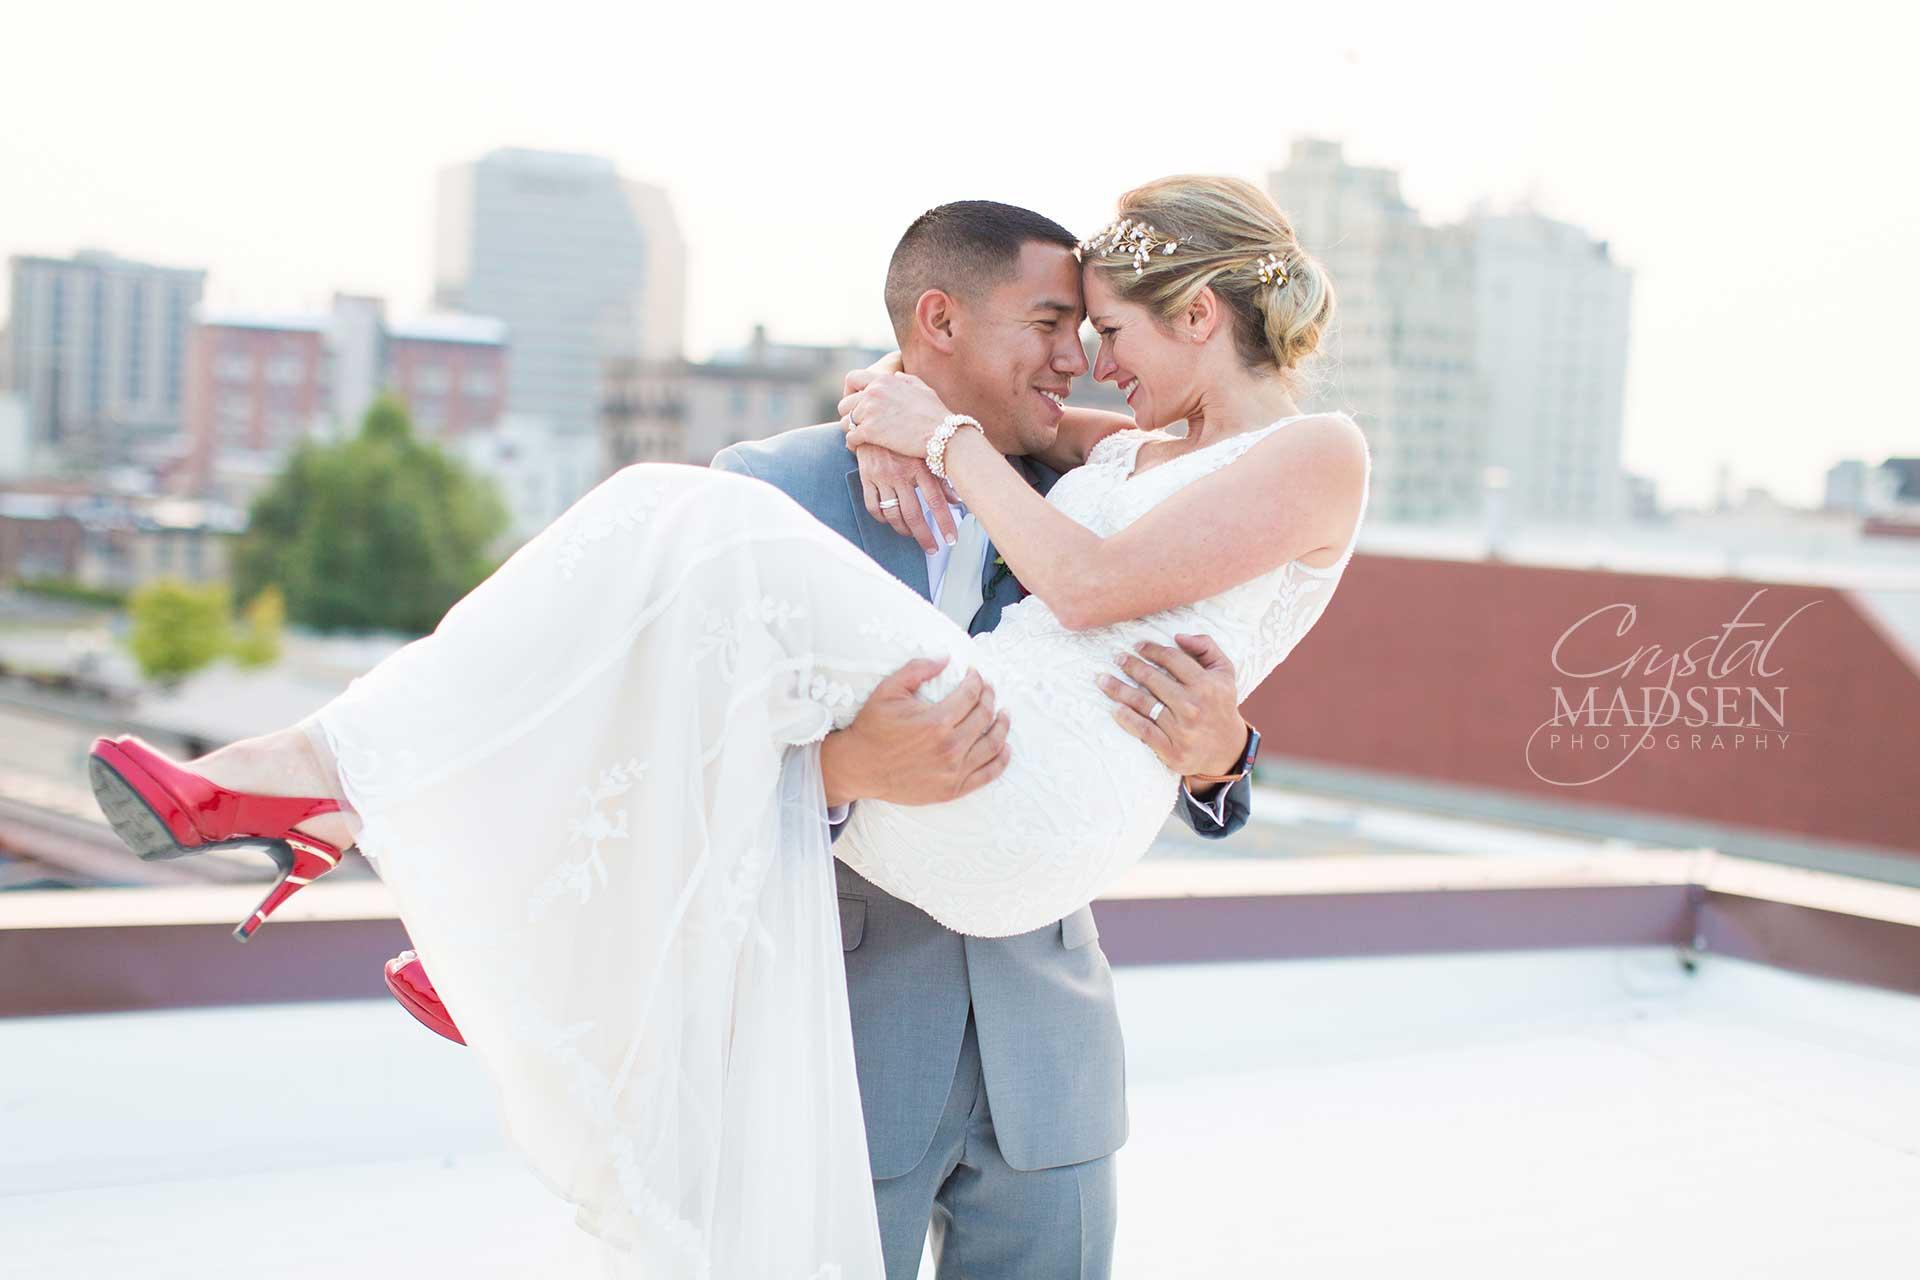 Rooftop romance spokane